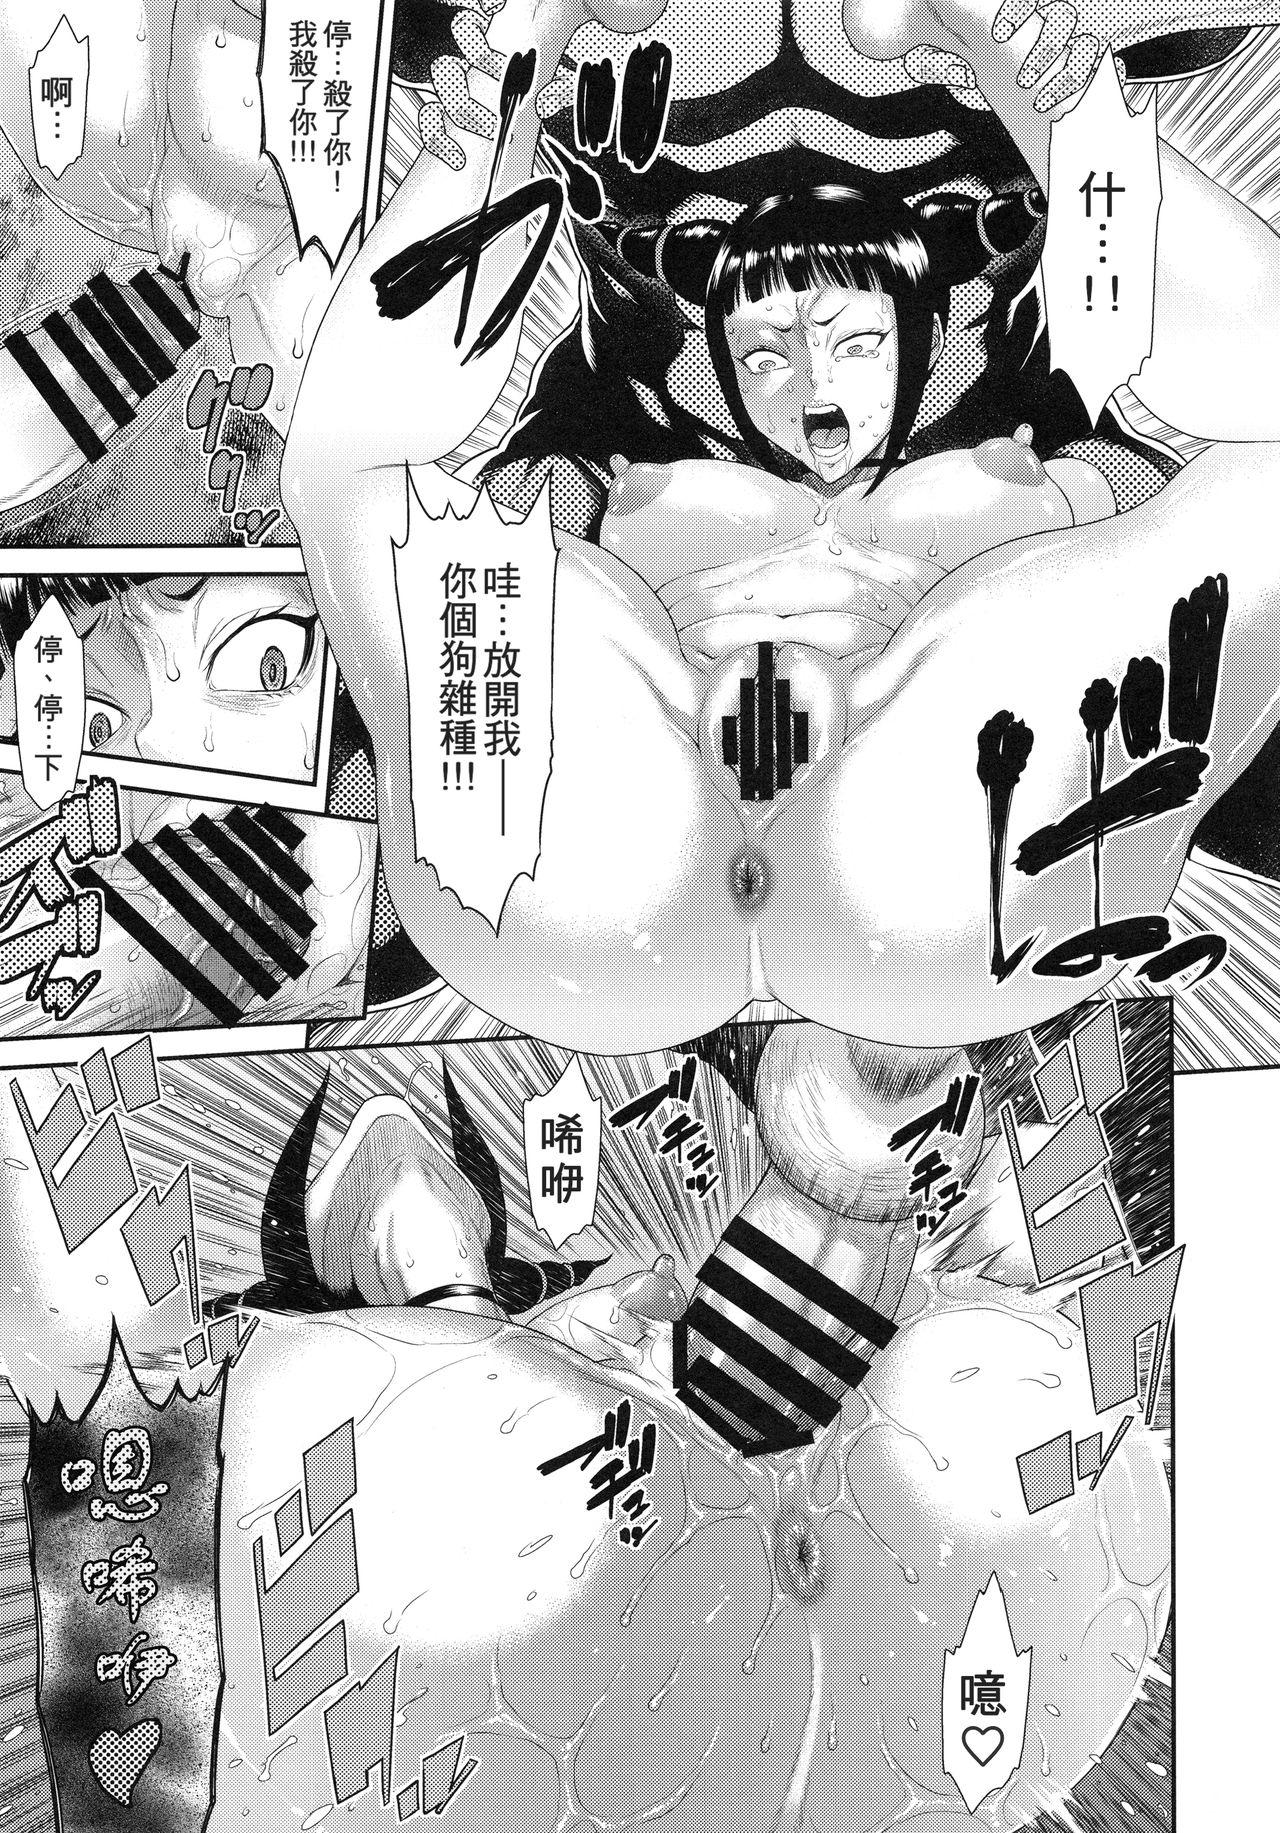 Jaaku - Wicked 10